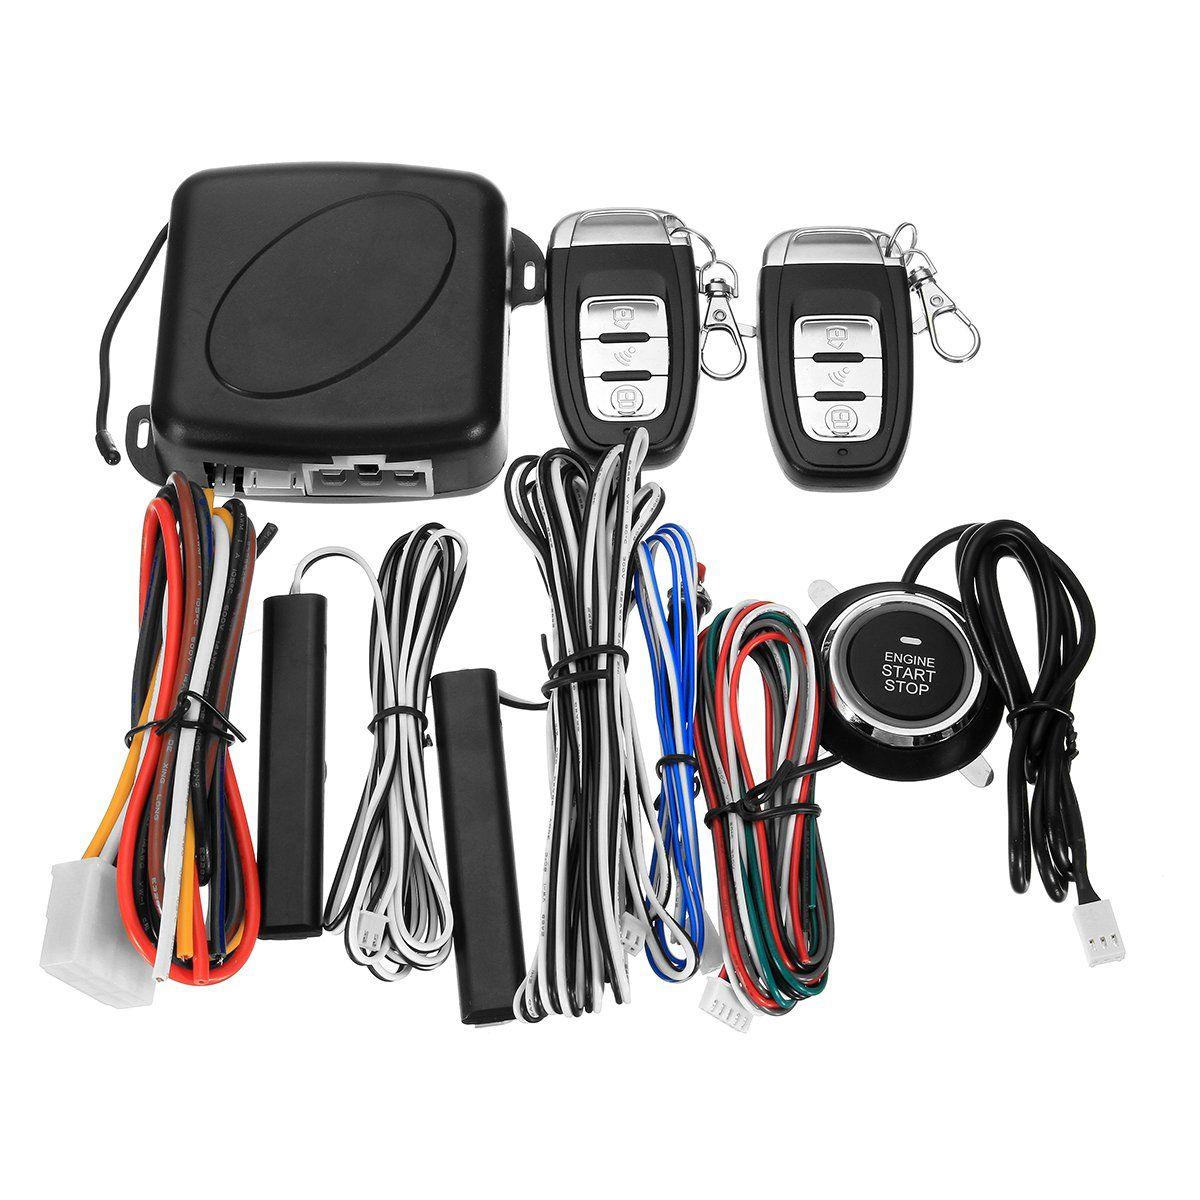 Smart Car Q6c Alarm System Push Button Amp Remote Start